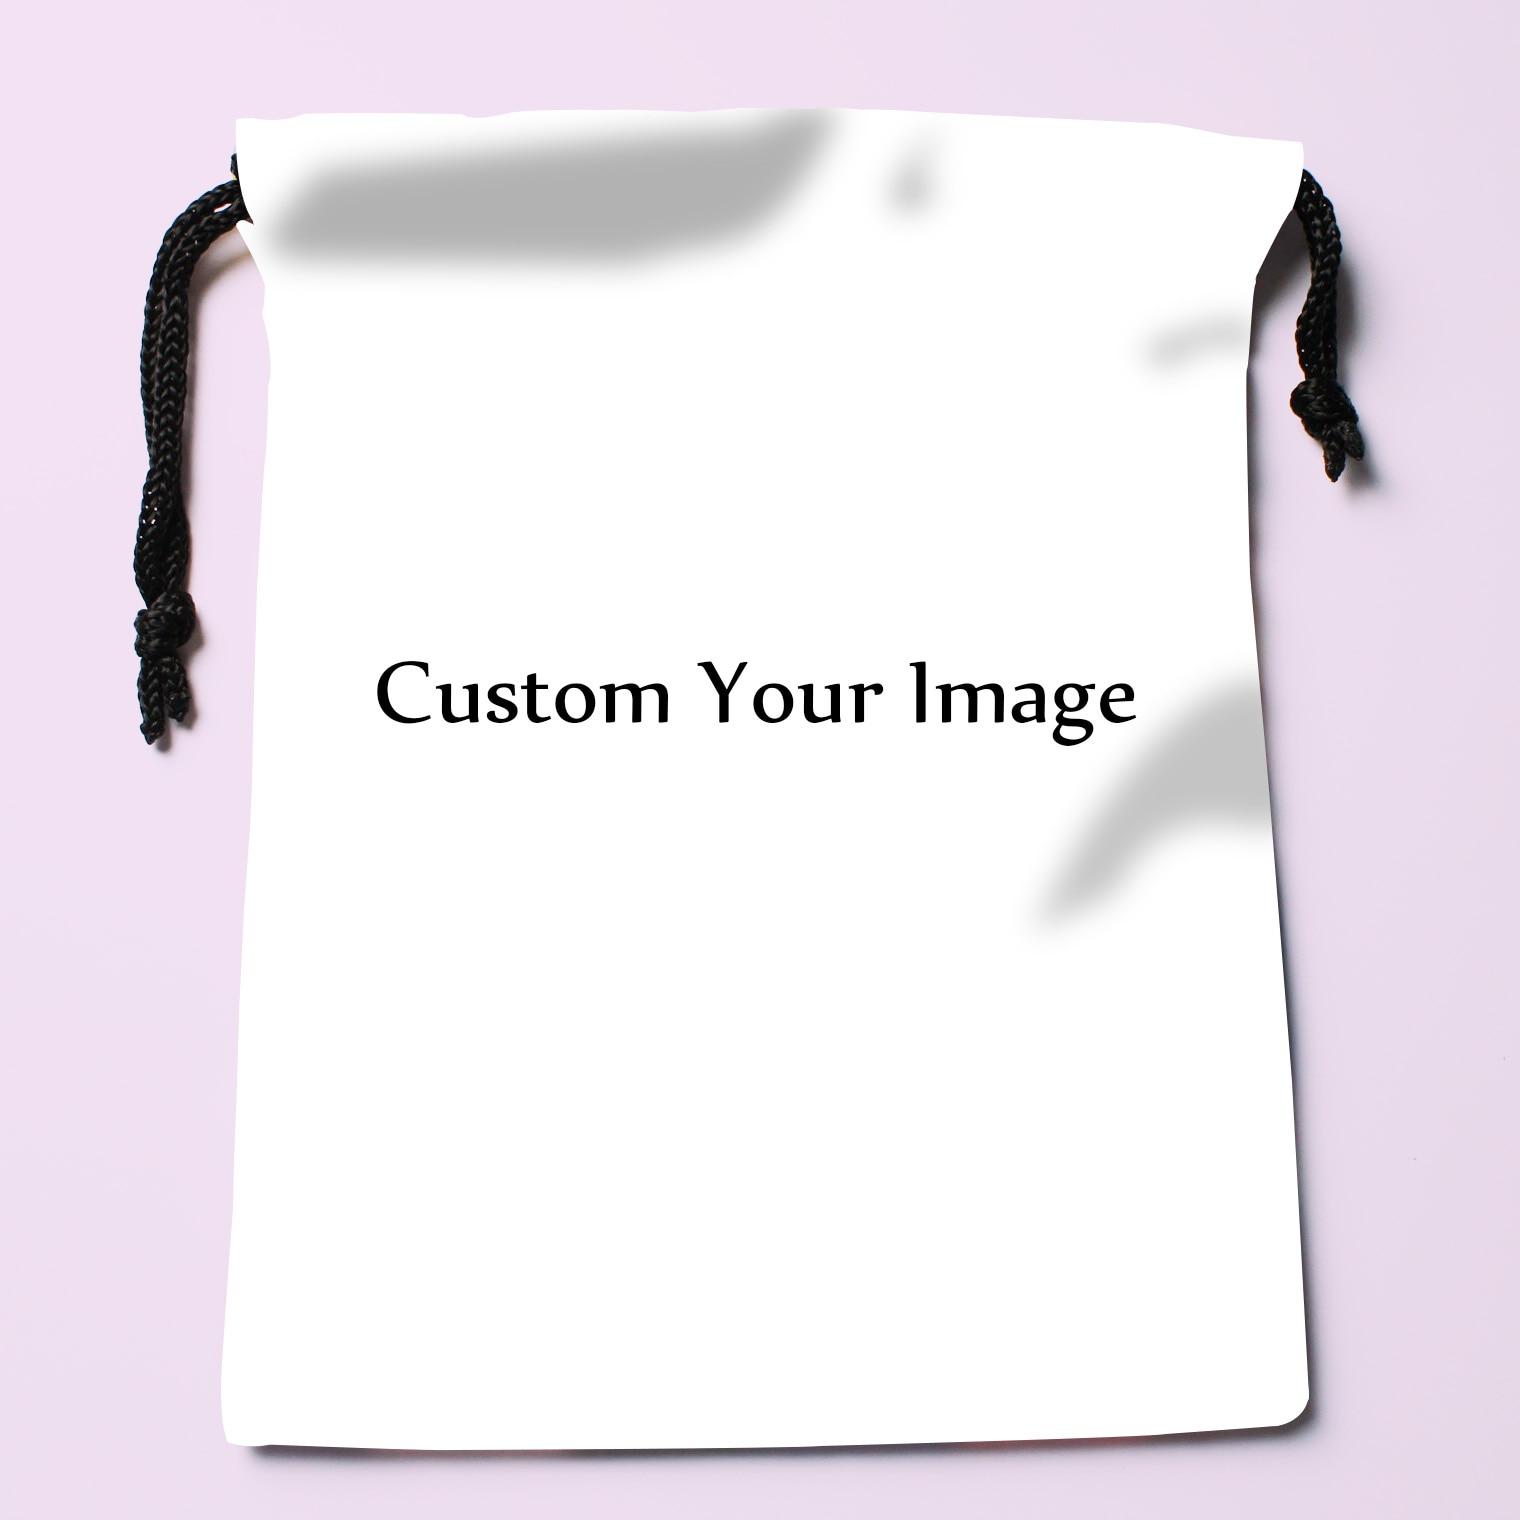 Satin Storage Bag Drawstring Gift Bags Custom Your Image 20x27cm